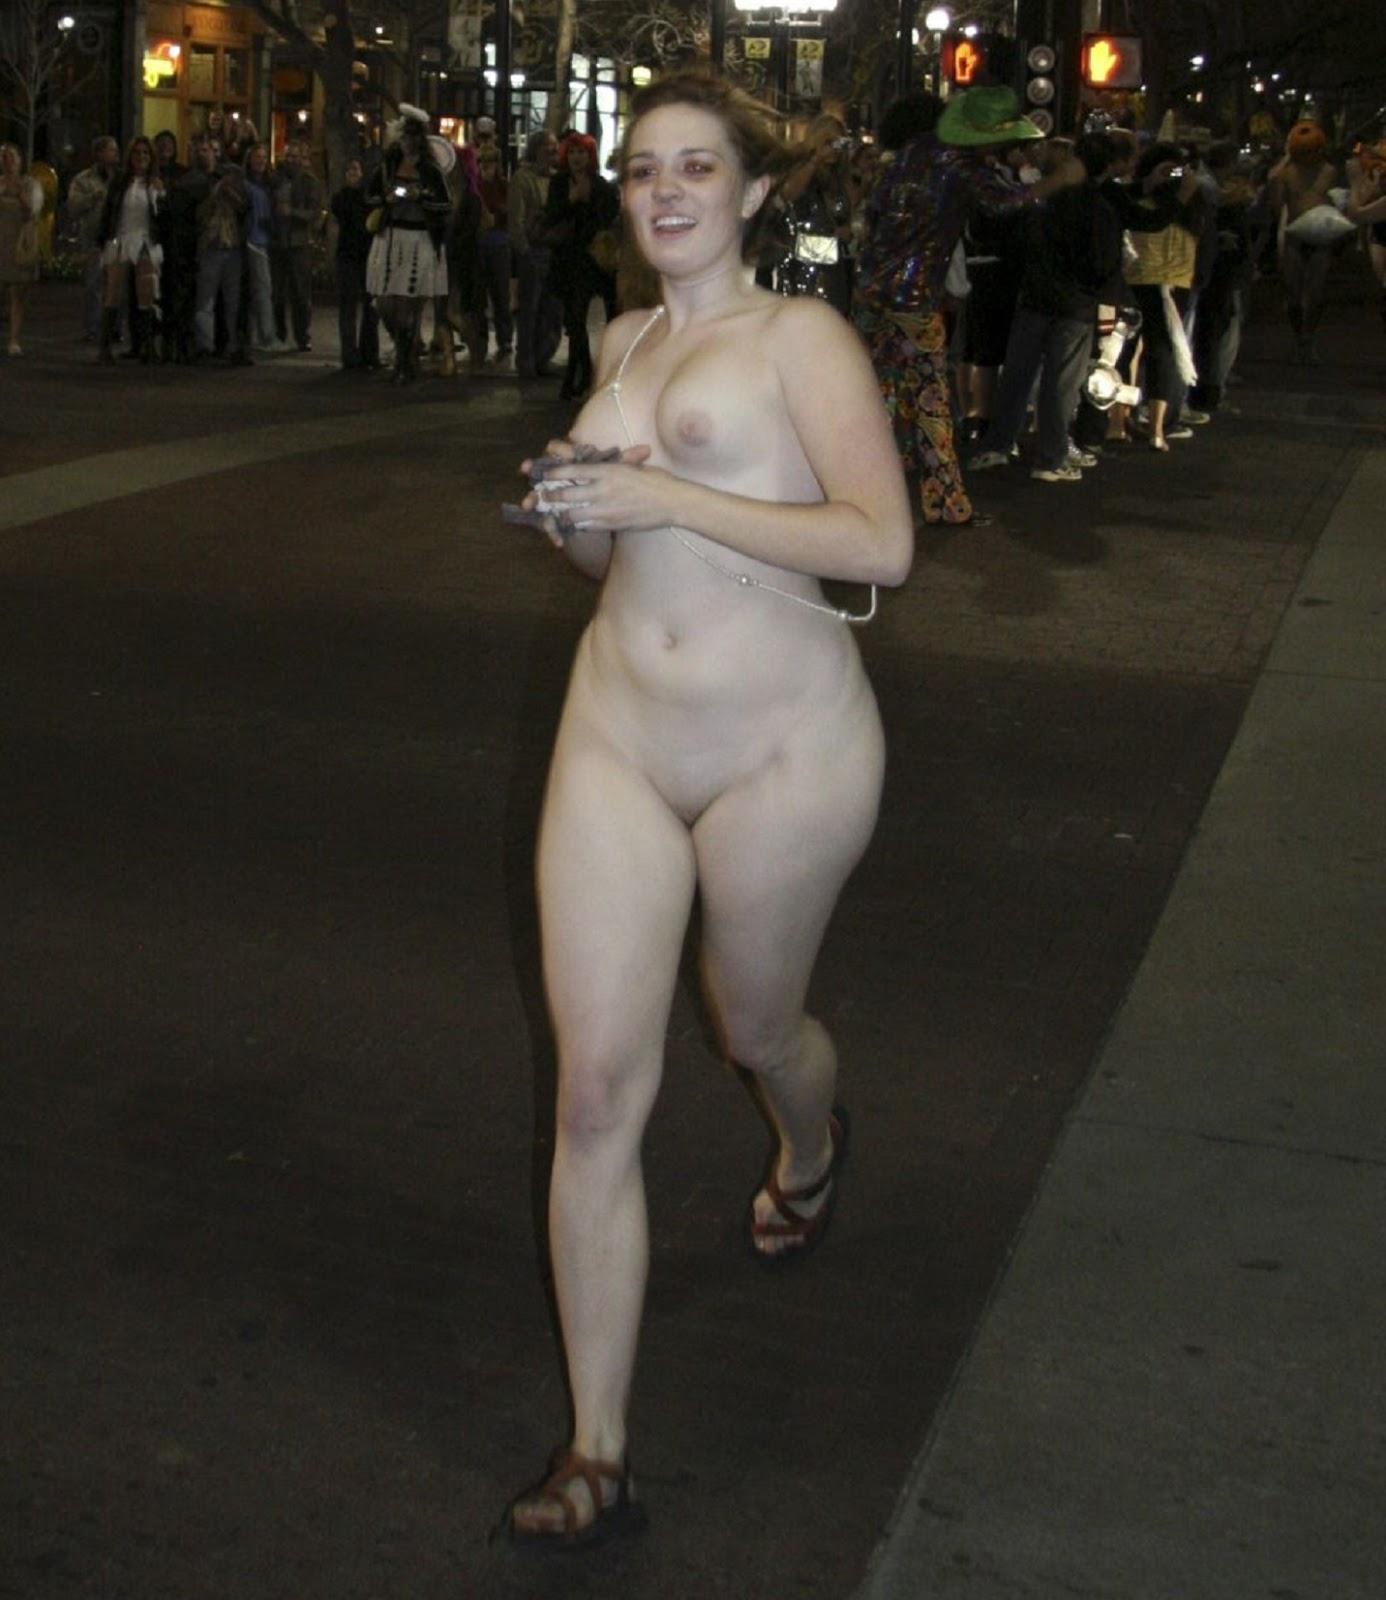 Girls Flashing In Public